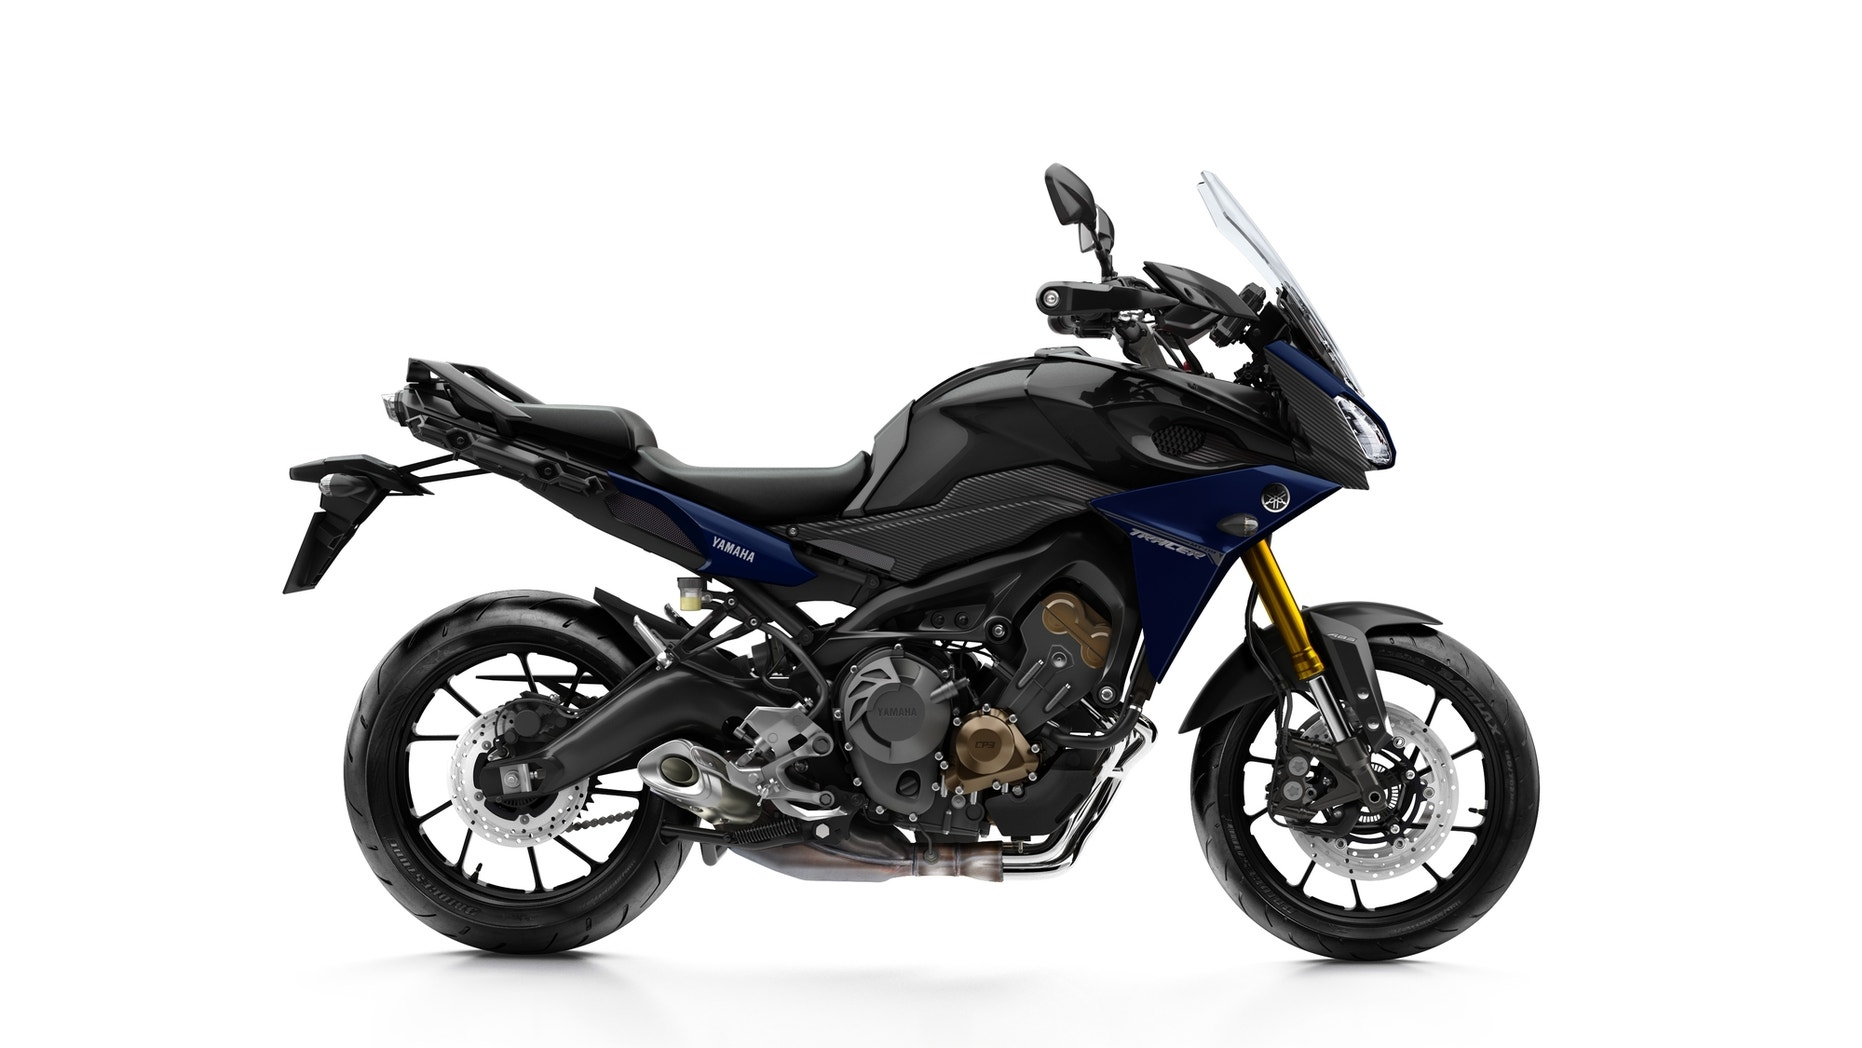 The MT-09 Tracer. (Yamaha)